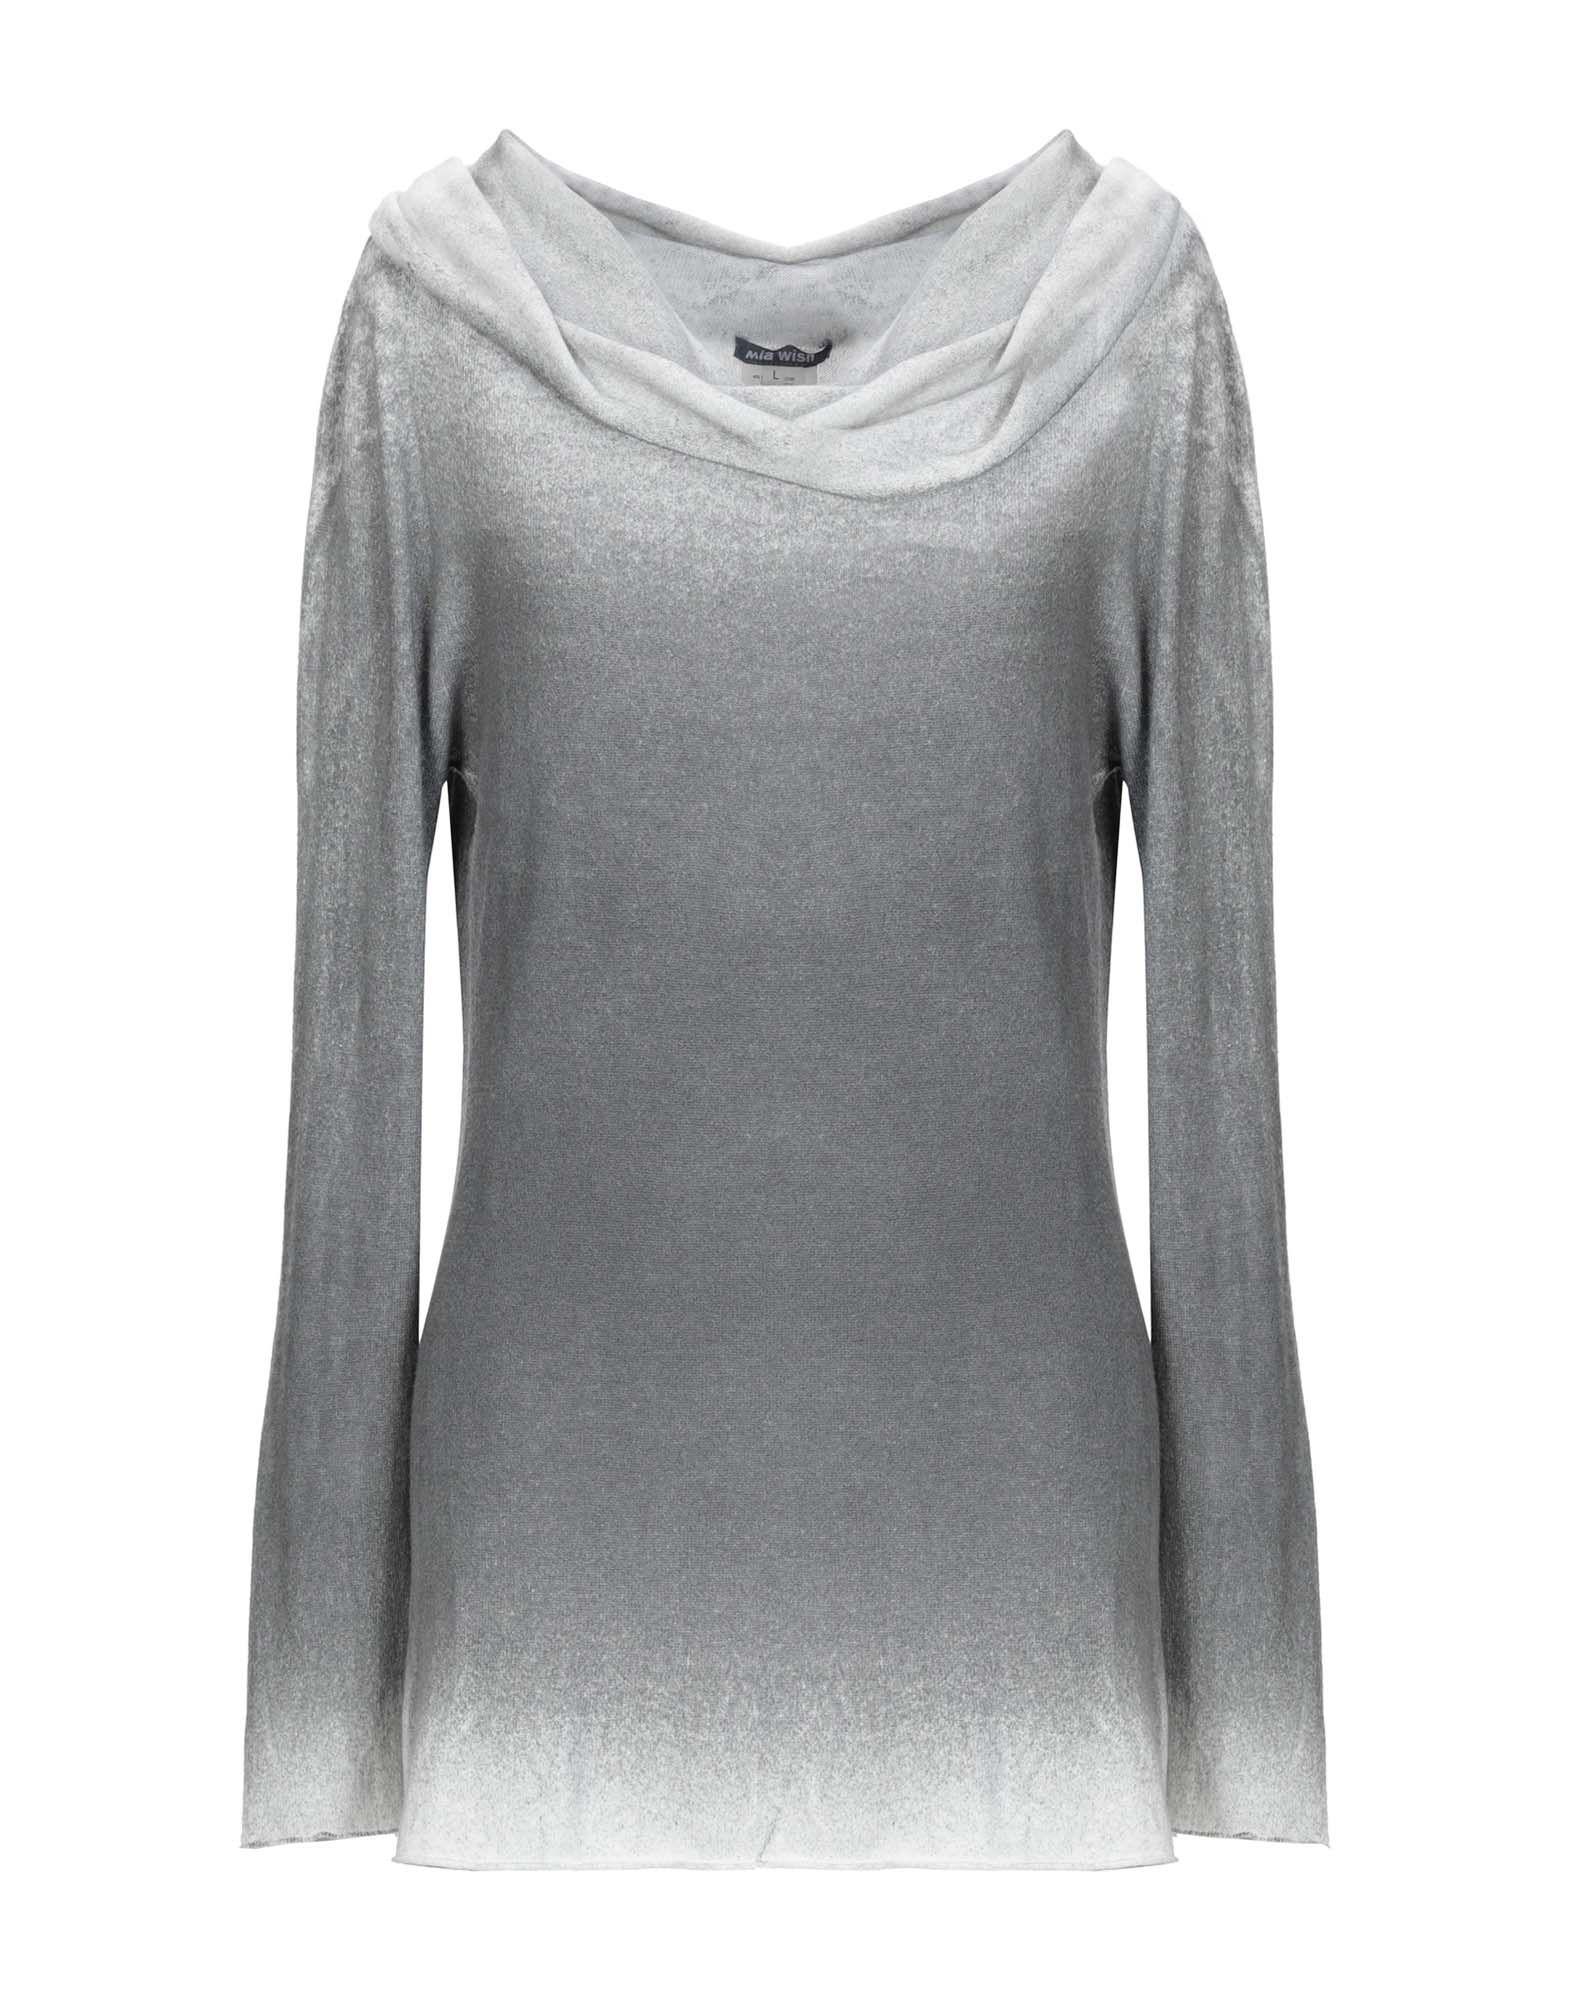 MIA WISH Свитер джемперы свитера пуловеры coccodrillo свитер для девочки make a wish